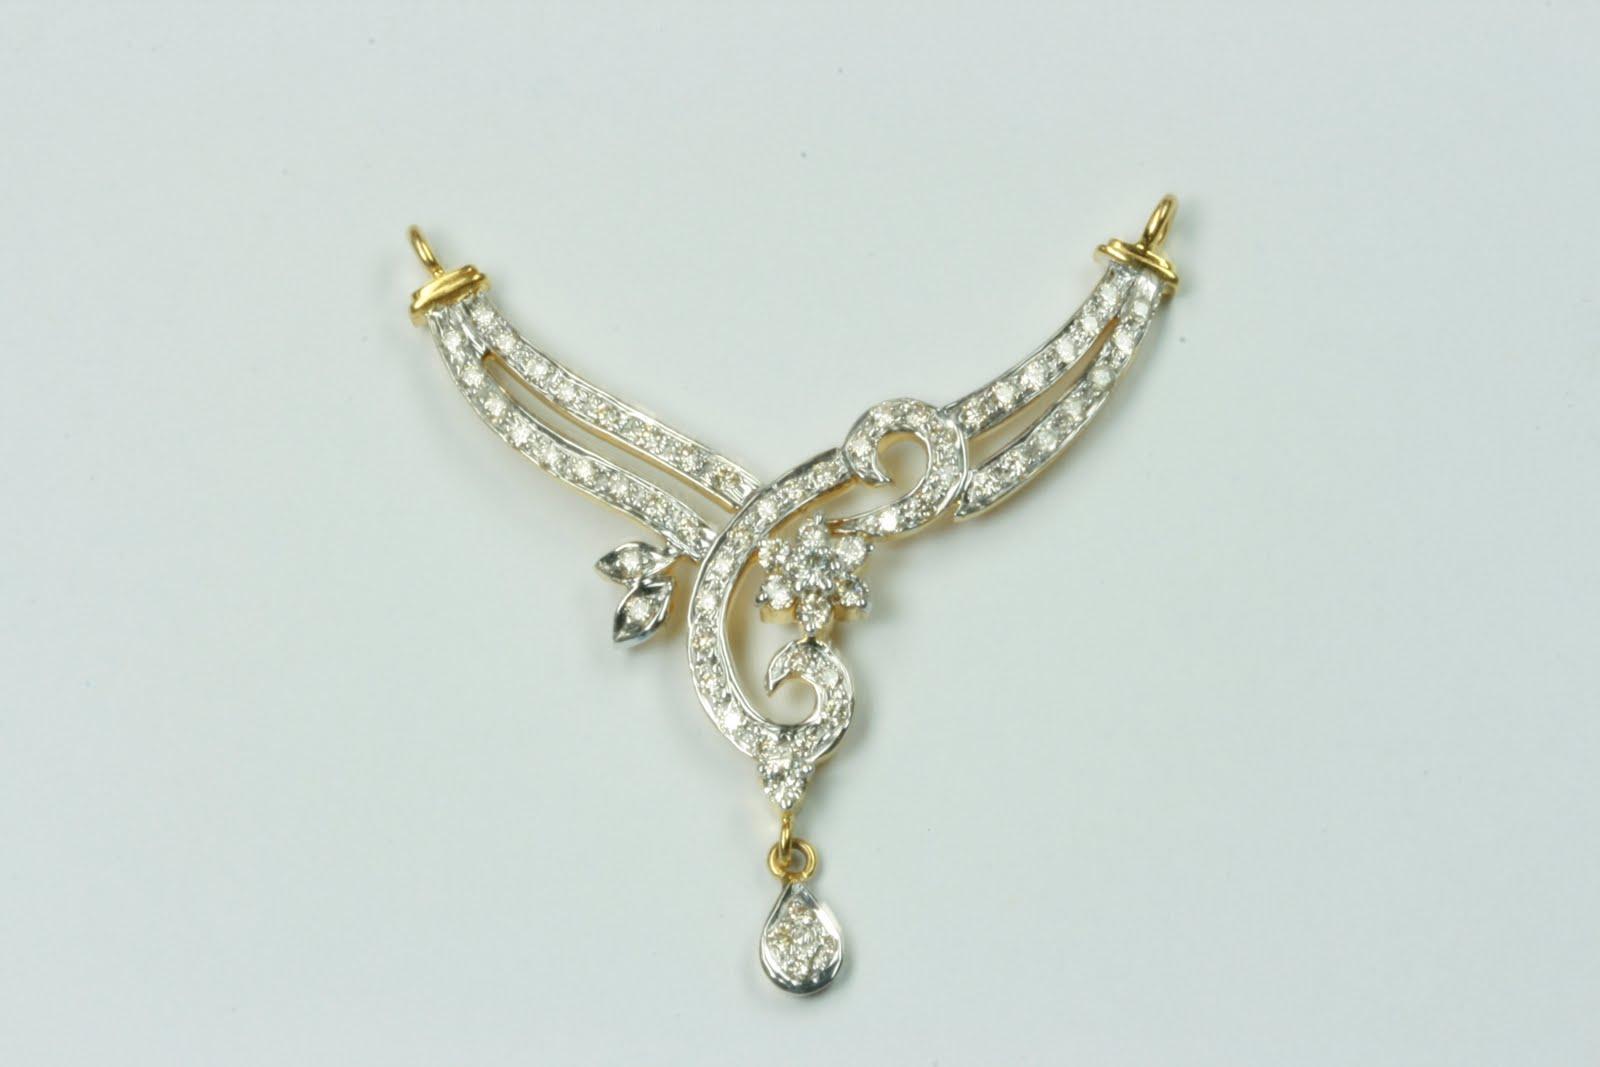 sone pe suhaga light weight mangalsutra pendants